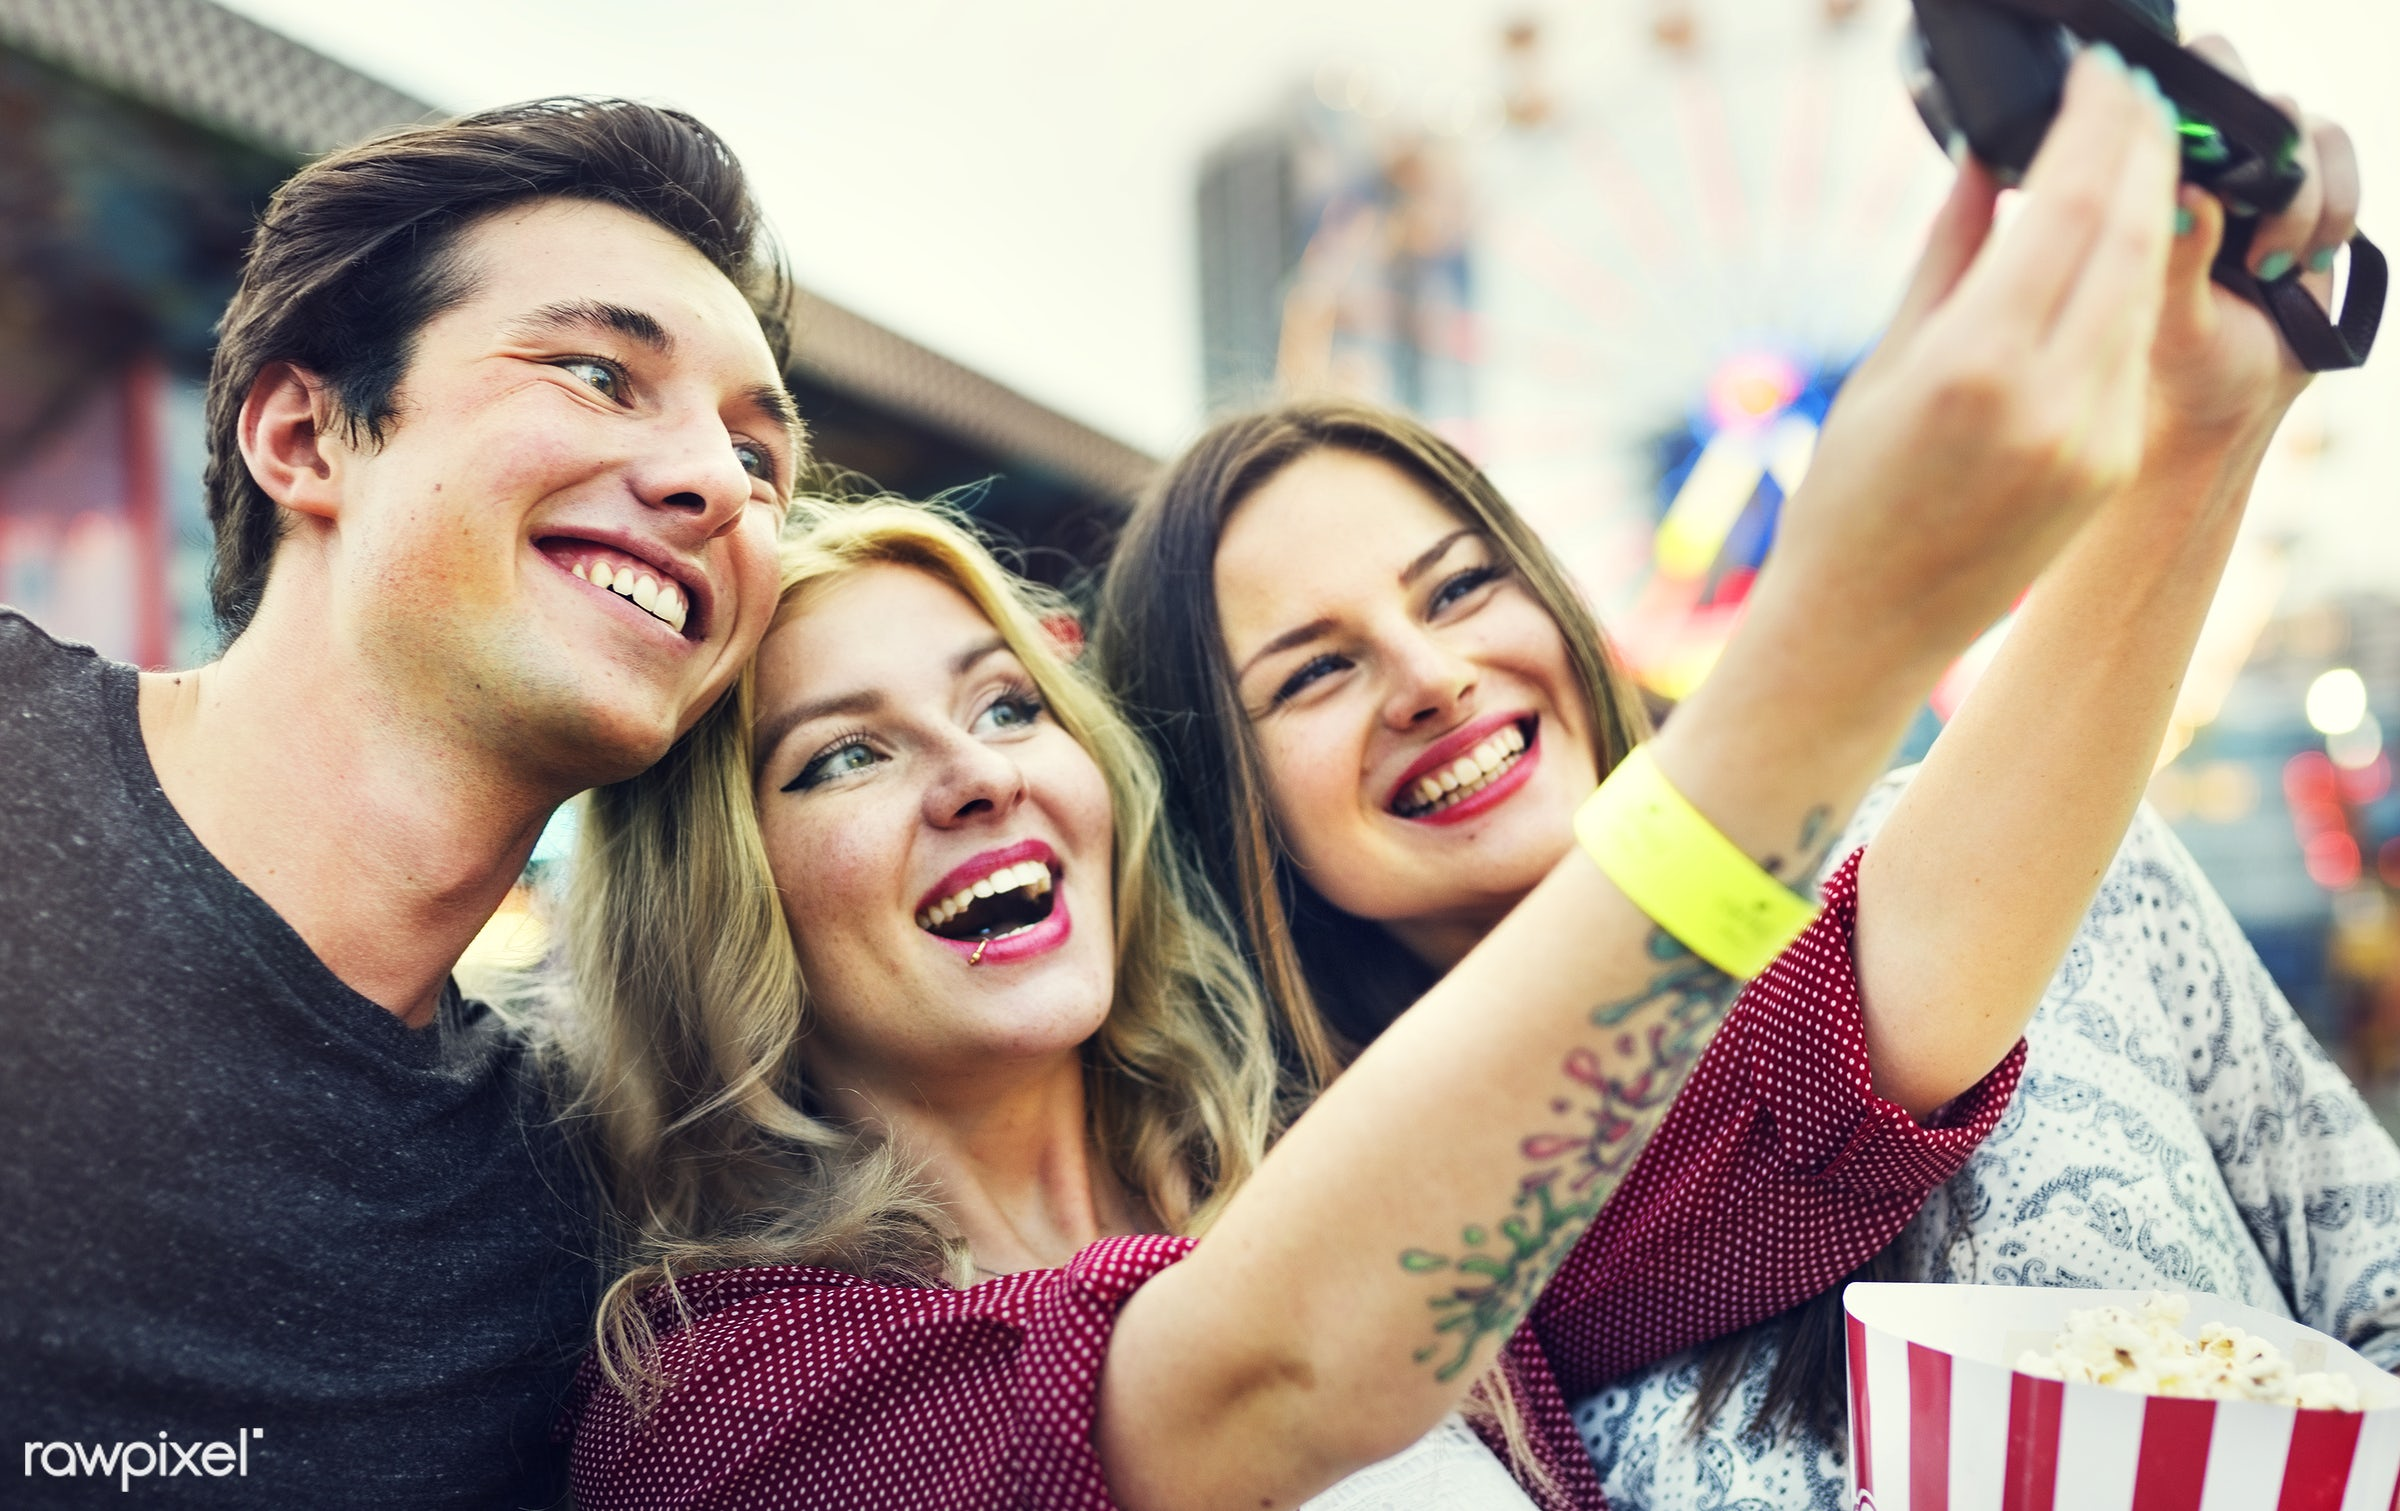 A group of friends is enjoying the amusement park - selfie, amusement park, camera, device, digital, eat, enjoyment,...